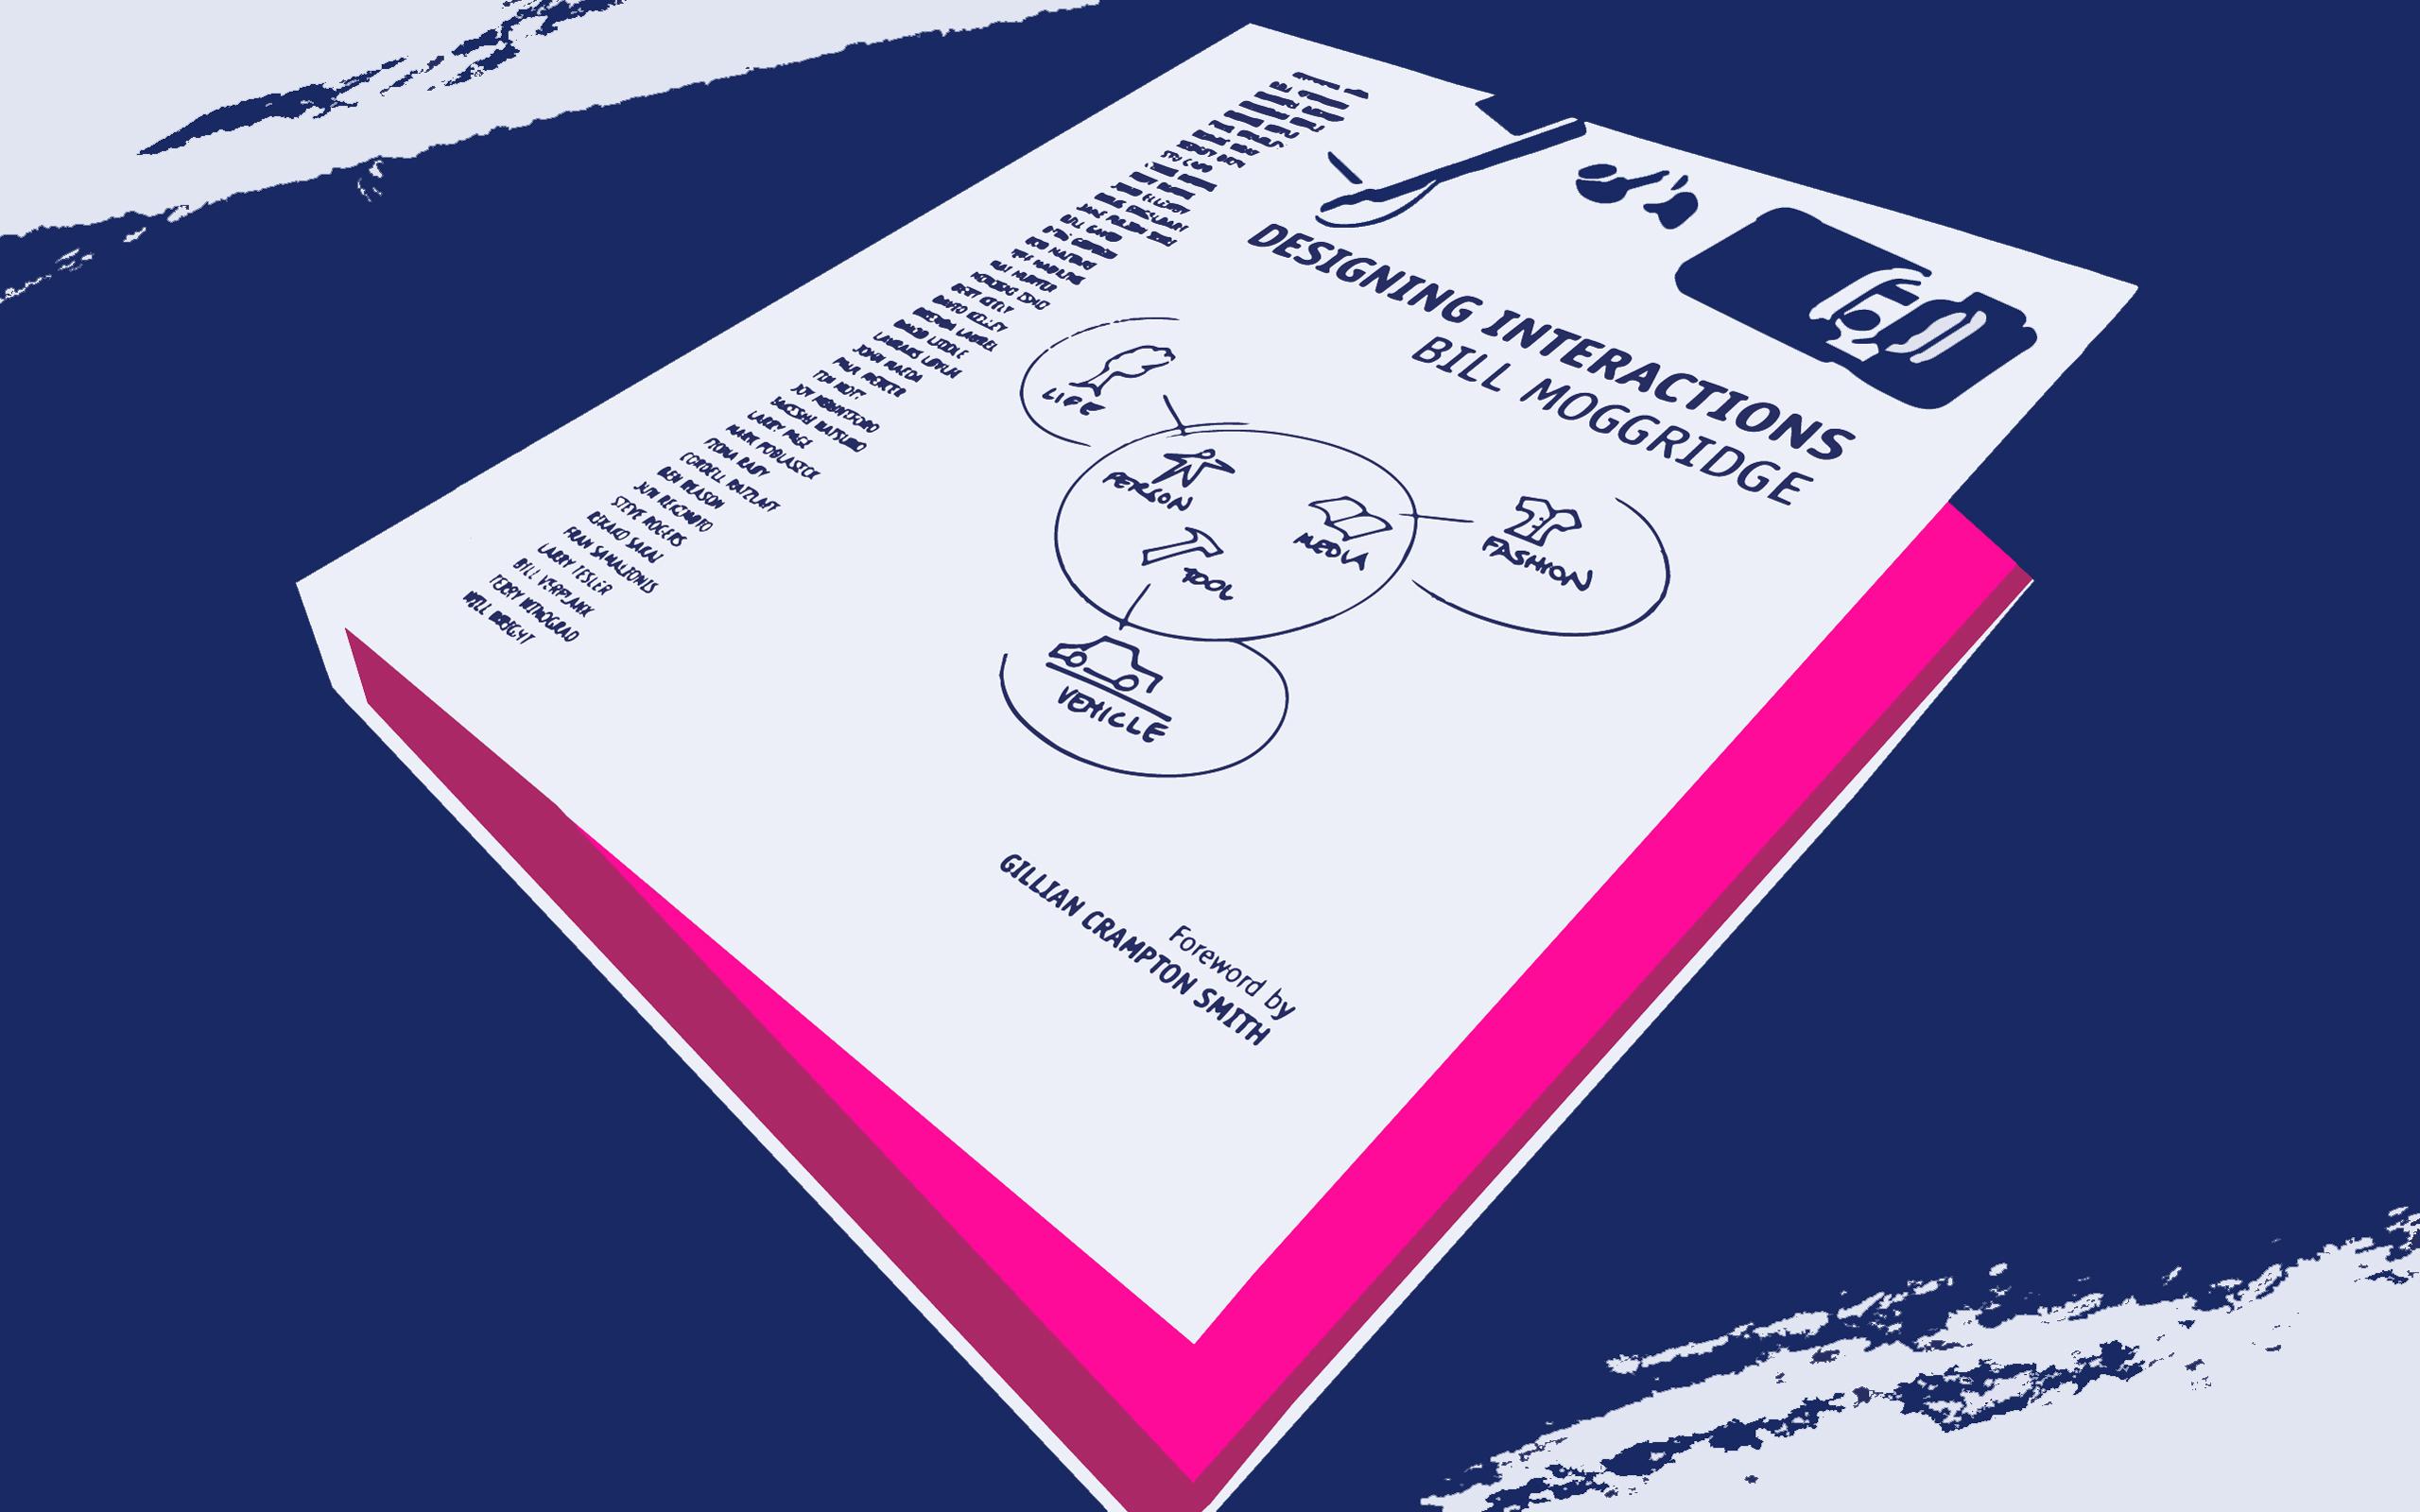 <strong>Dominik's Buchtipp aus der Eyekon-Bibliothek:</strong> Designing Interactions – Origin of Interaction Design